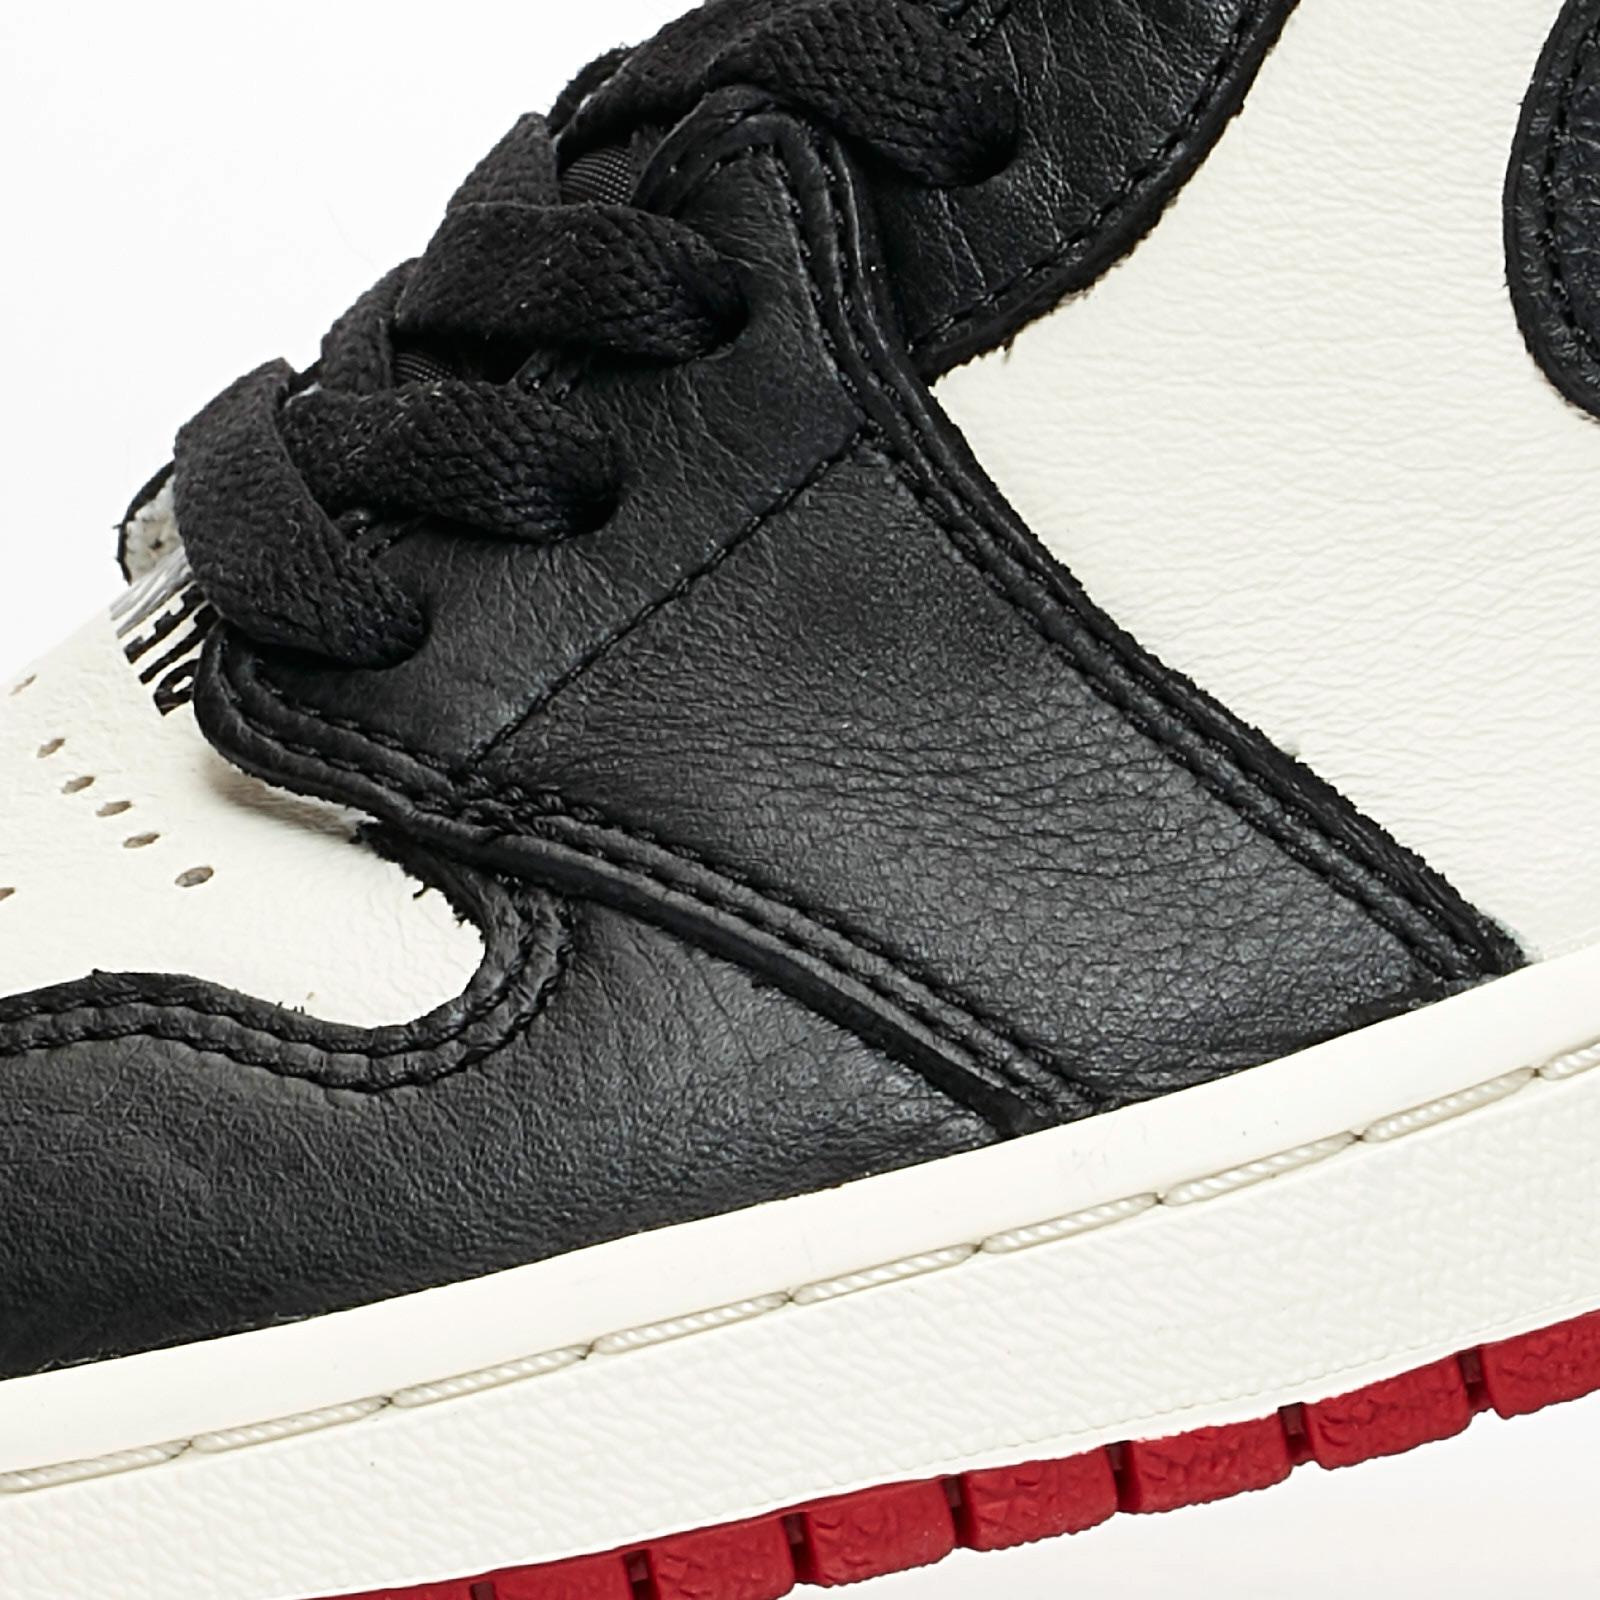 582ca3f24791ac Jordan Brand Air Jordan 1 Retro High NRG - 861428-106 - Sneakersnstuff